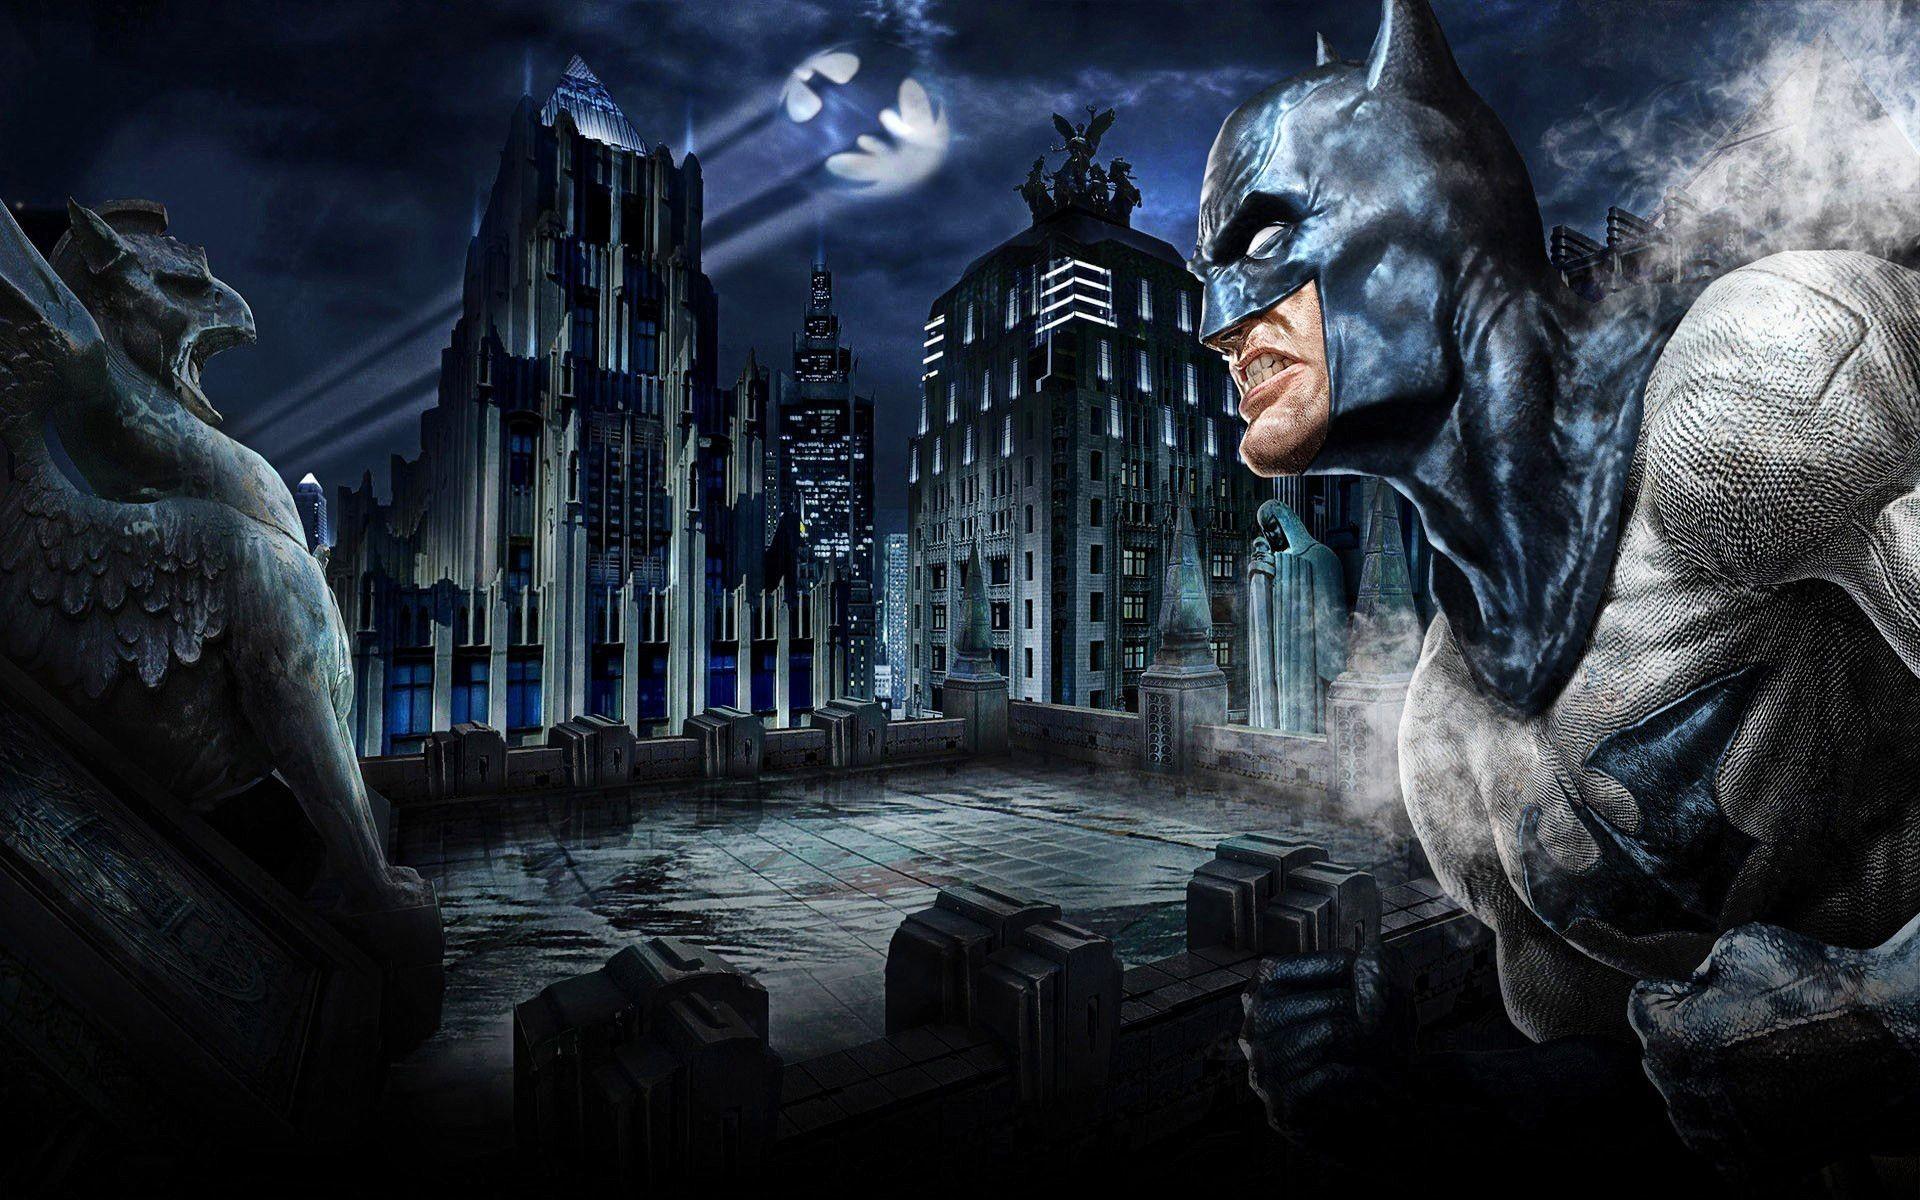 Batman Gotham City Background Wallpaper 26969 Hi-Resolution | Best .